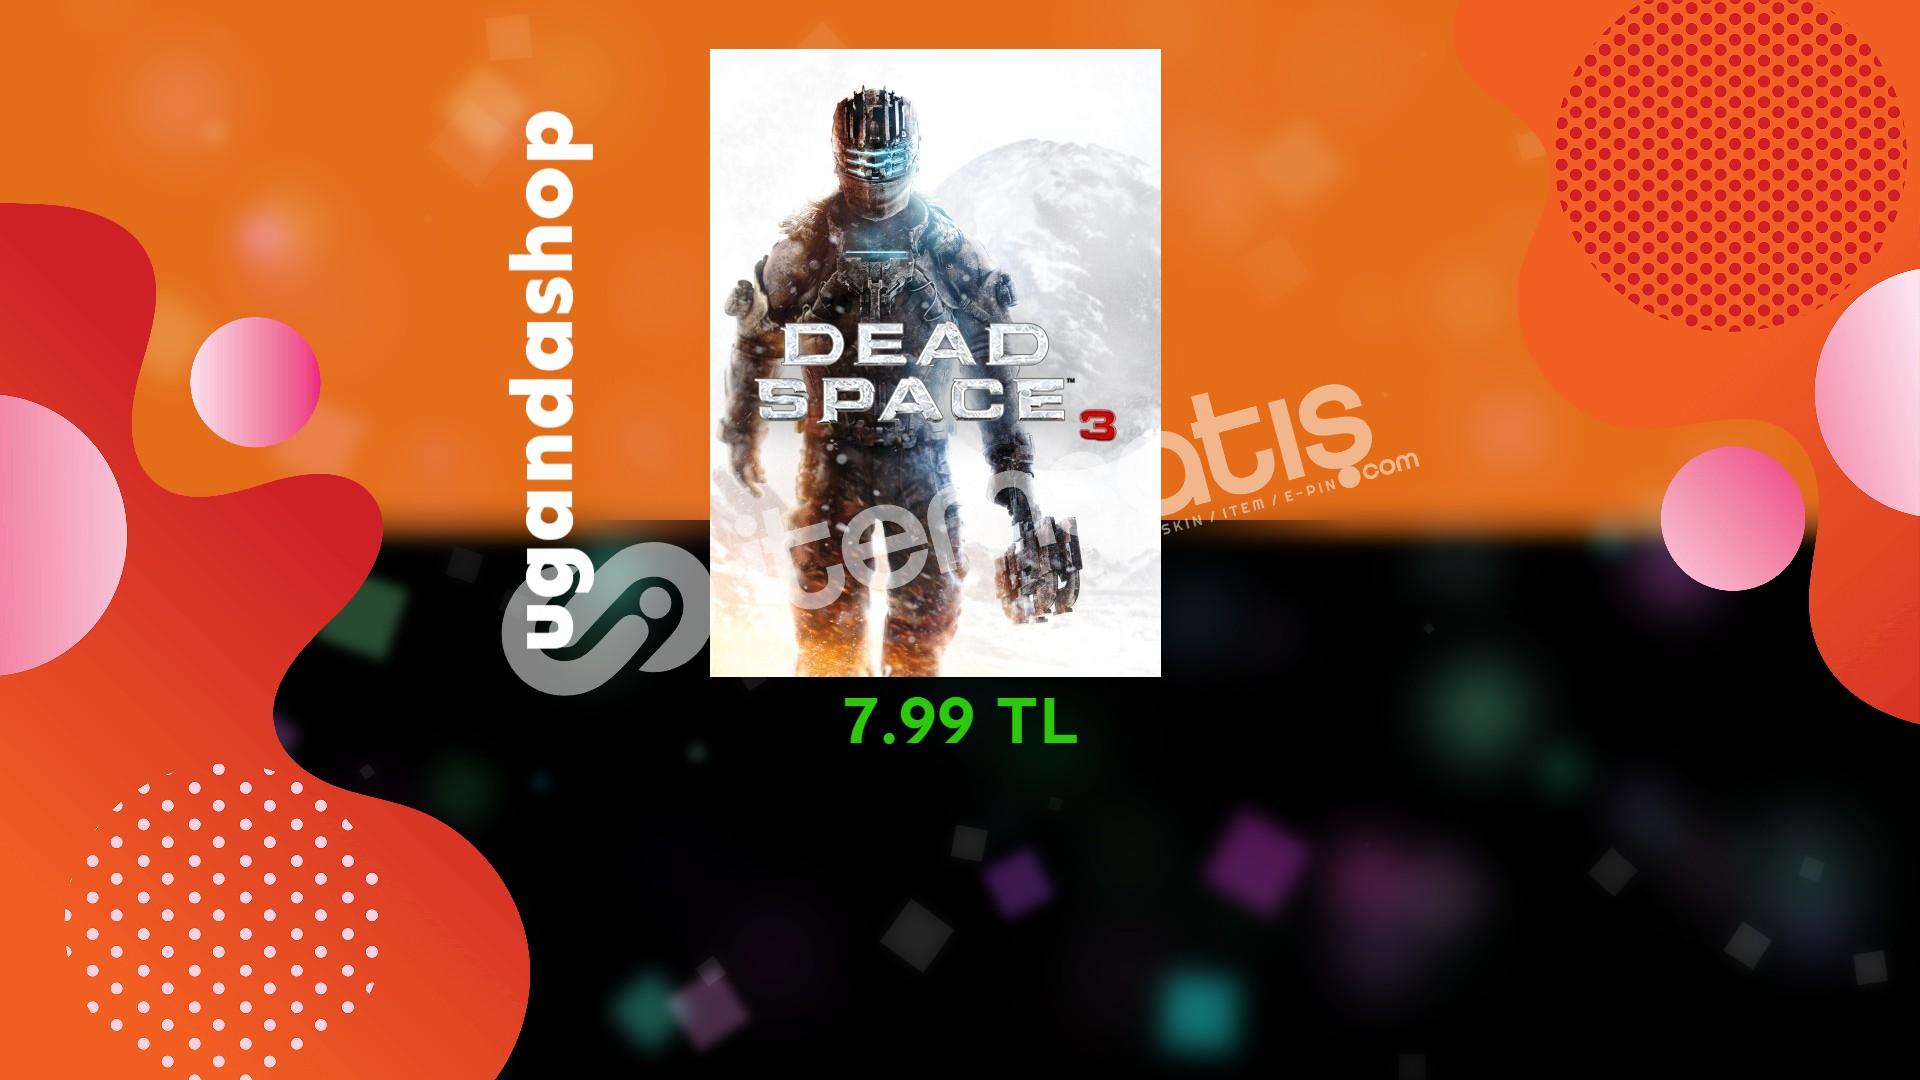 Dead Space 3 Online Origin Hesap + Garanti